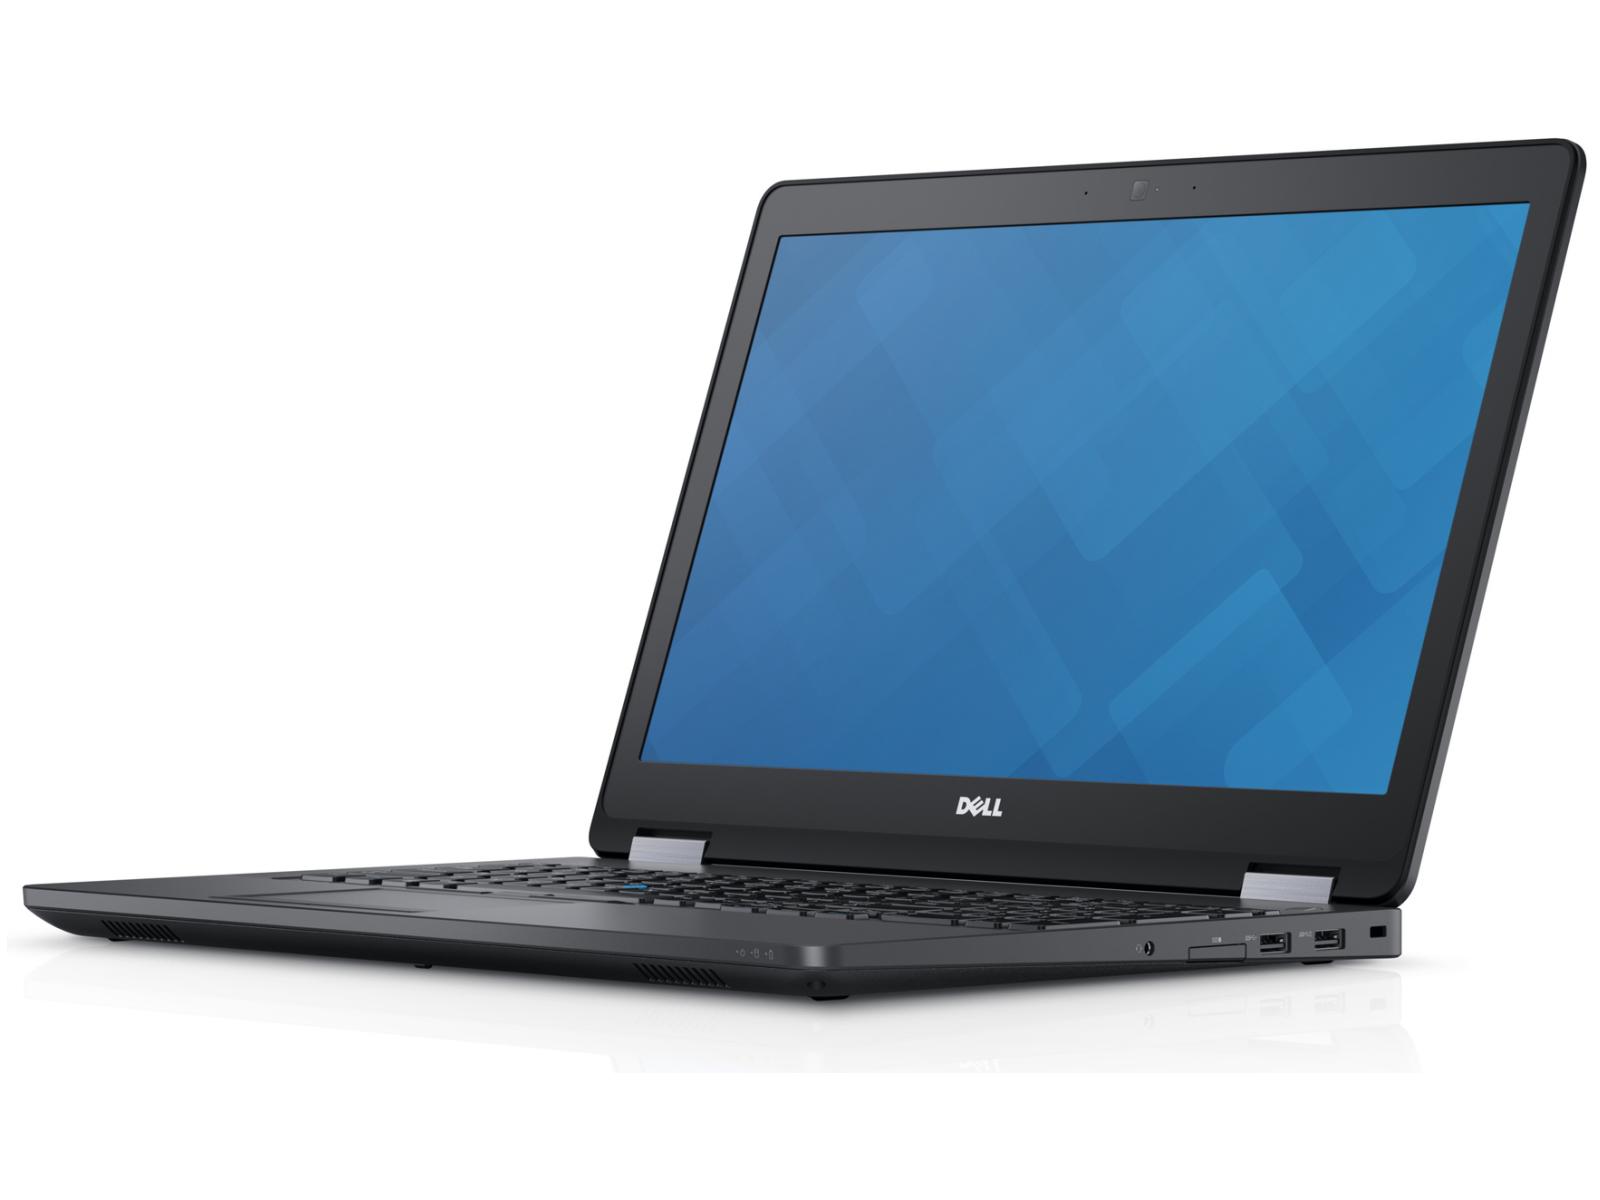 Dell Latitude 15 E5570 Notebook Review - NotebookCheck net Reviews